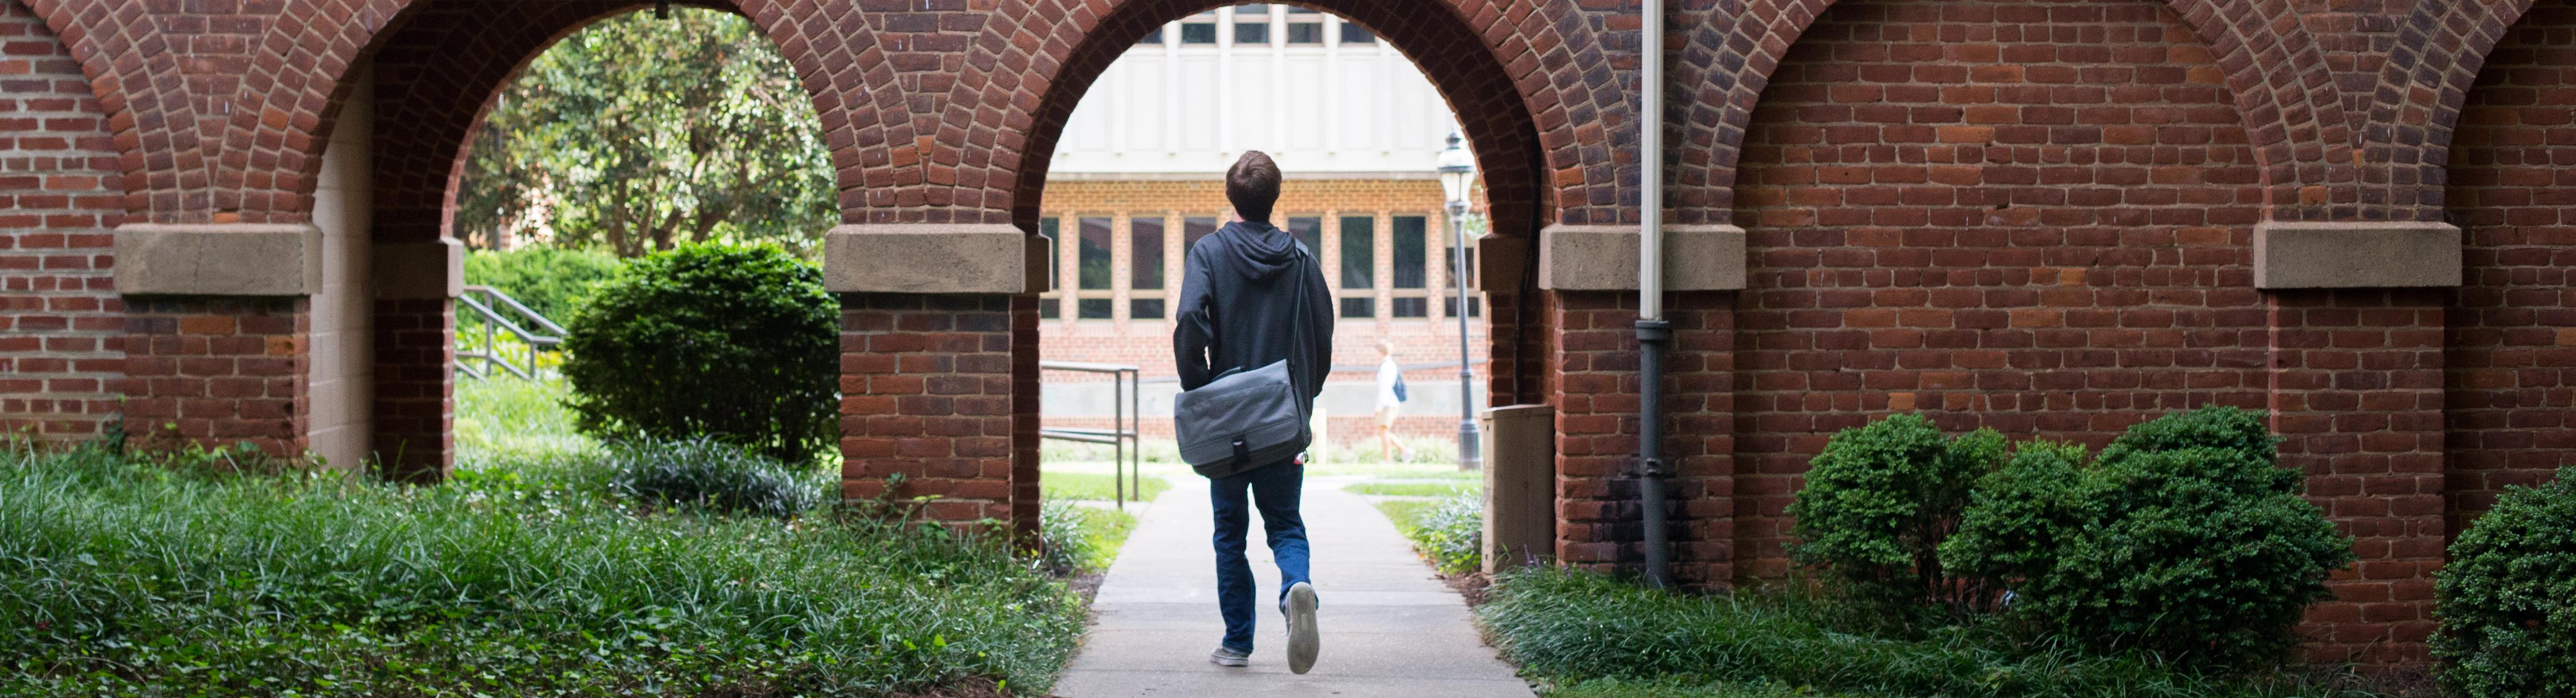 Photo of student walking through campus.